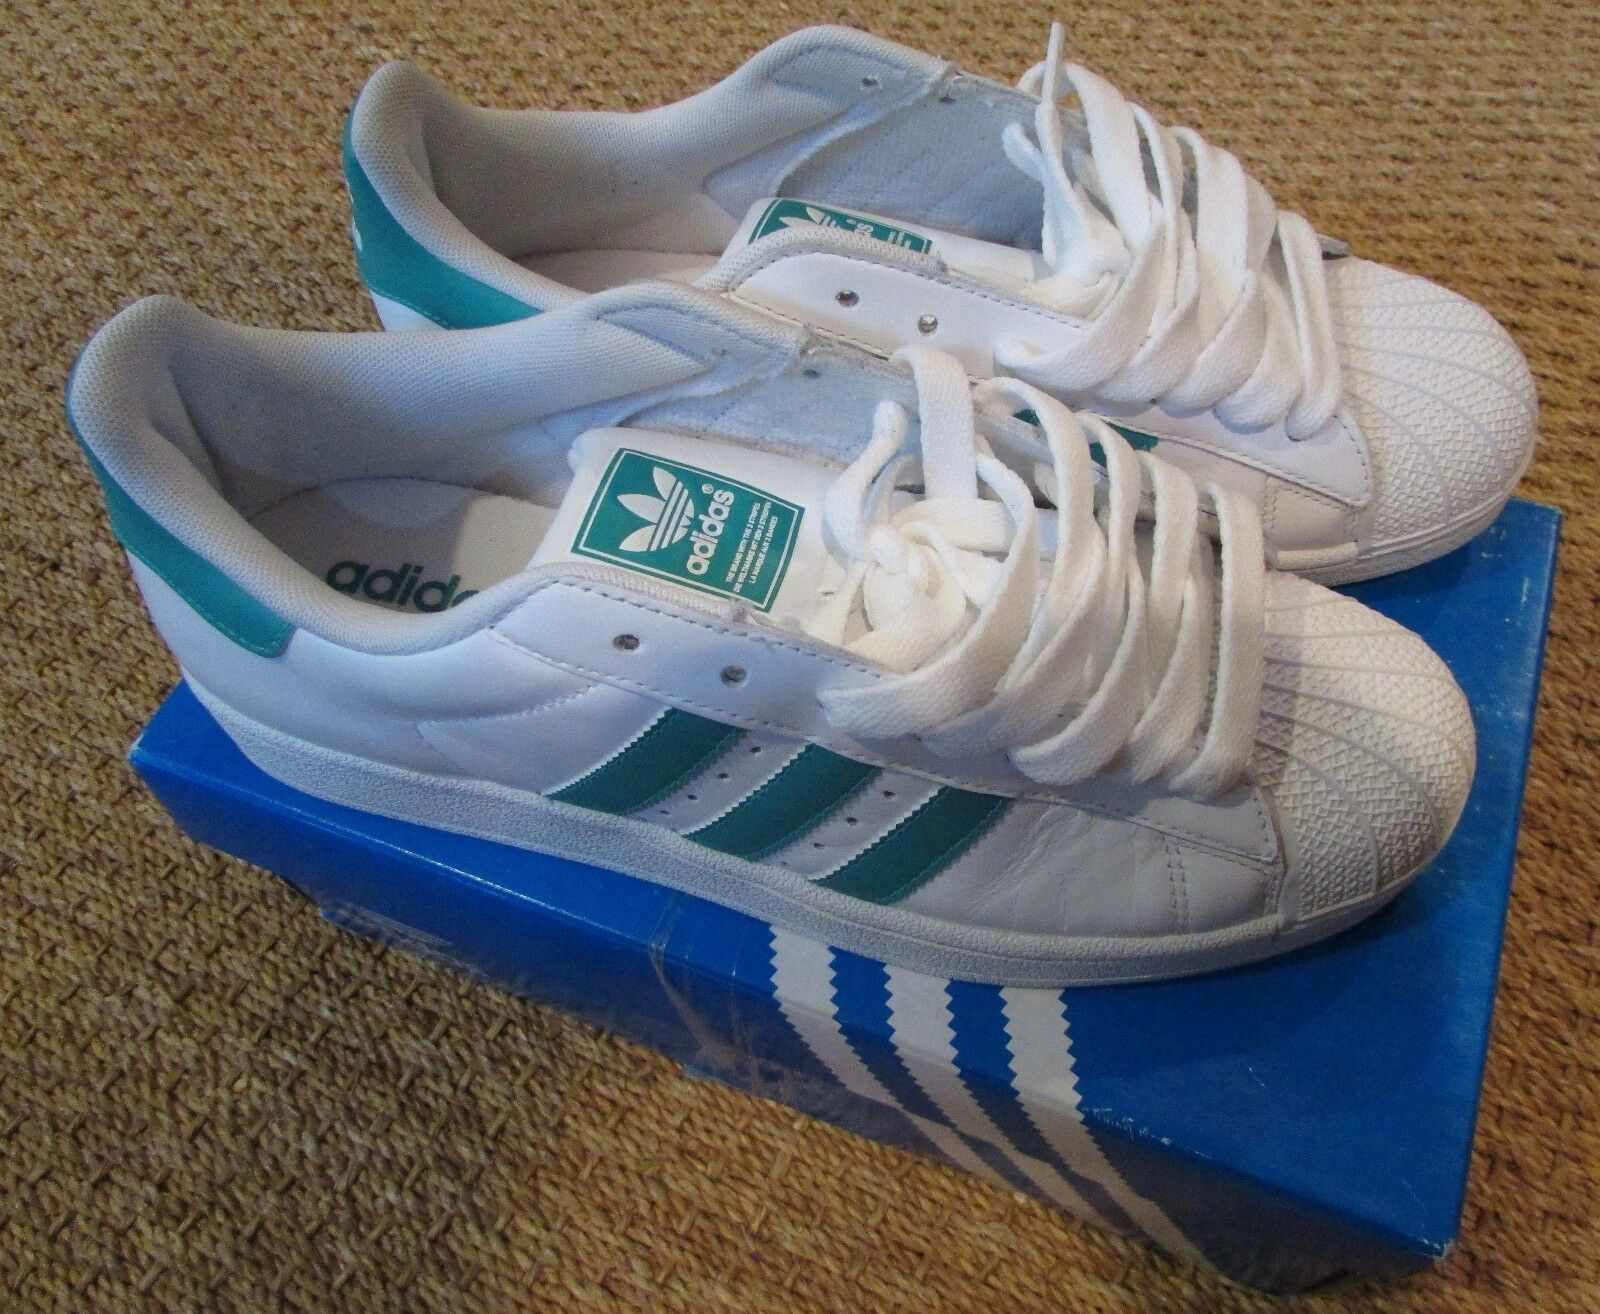 Adidas Superstar II Sneakers Athletic Shoes blanc Aero Reef Original Box Sz 8.5